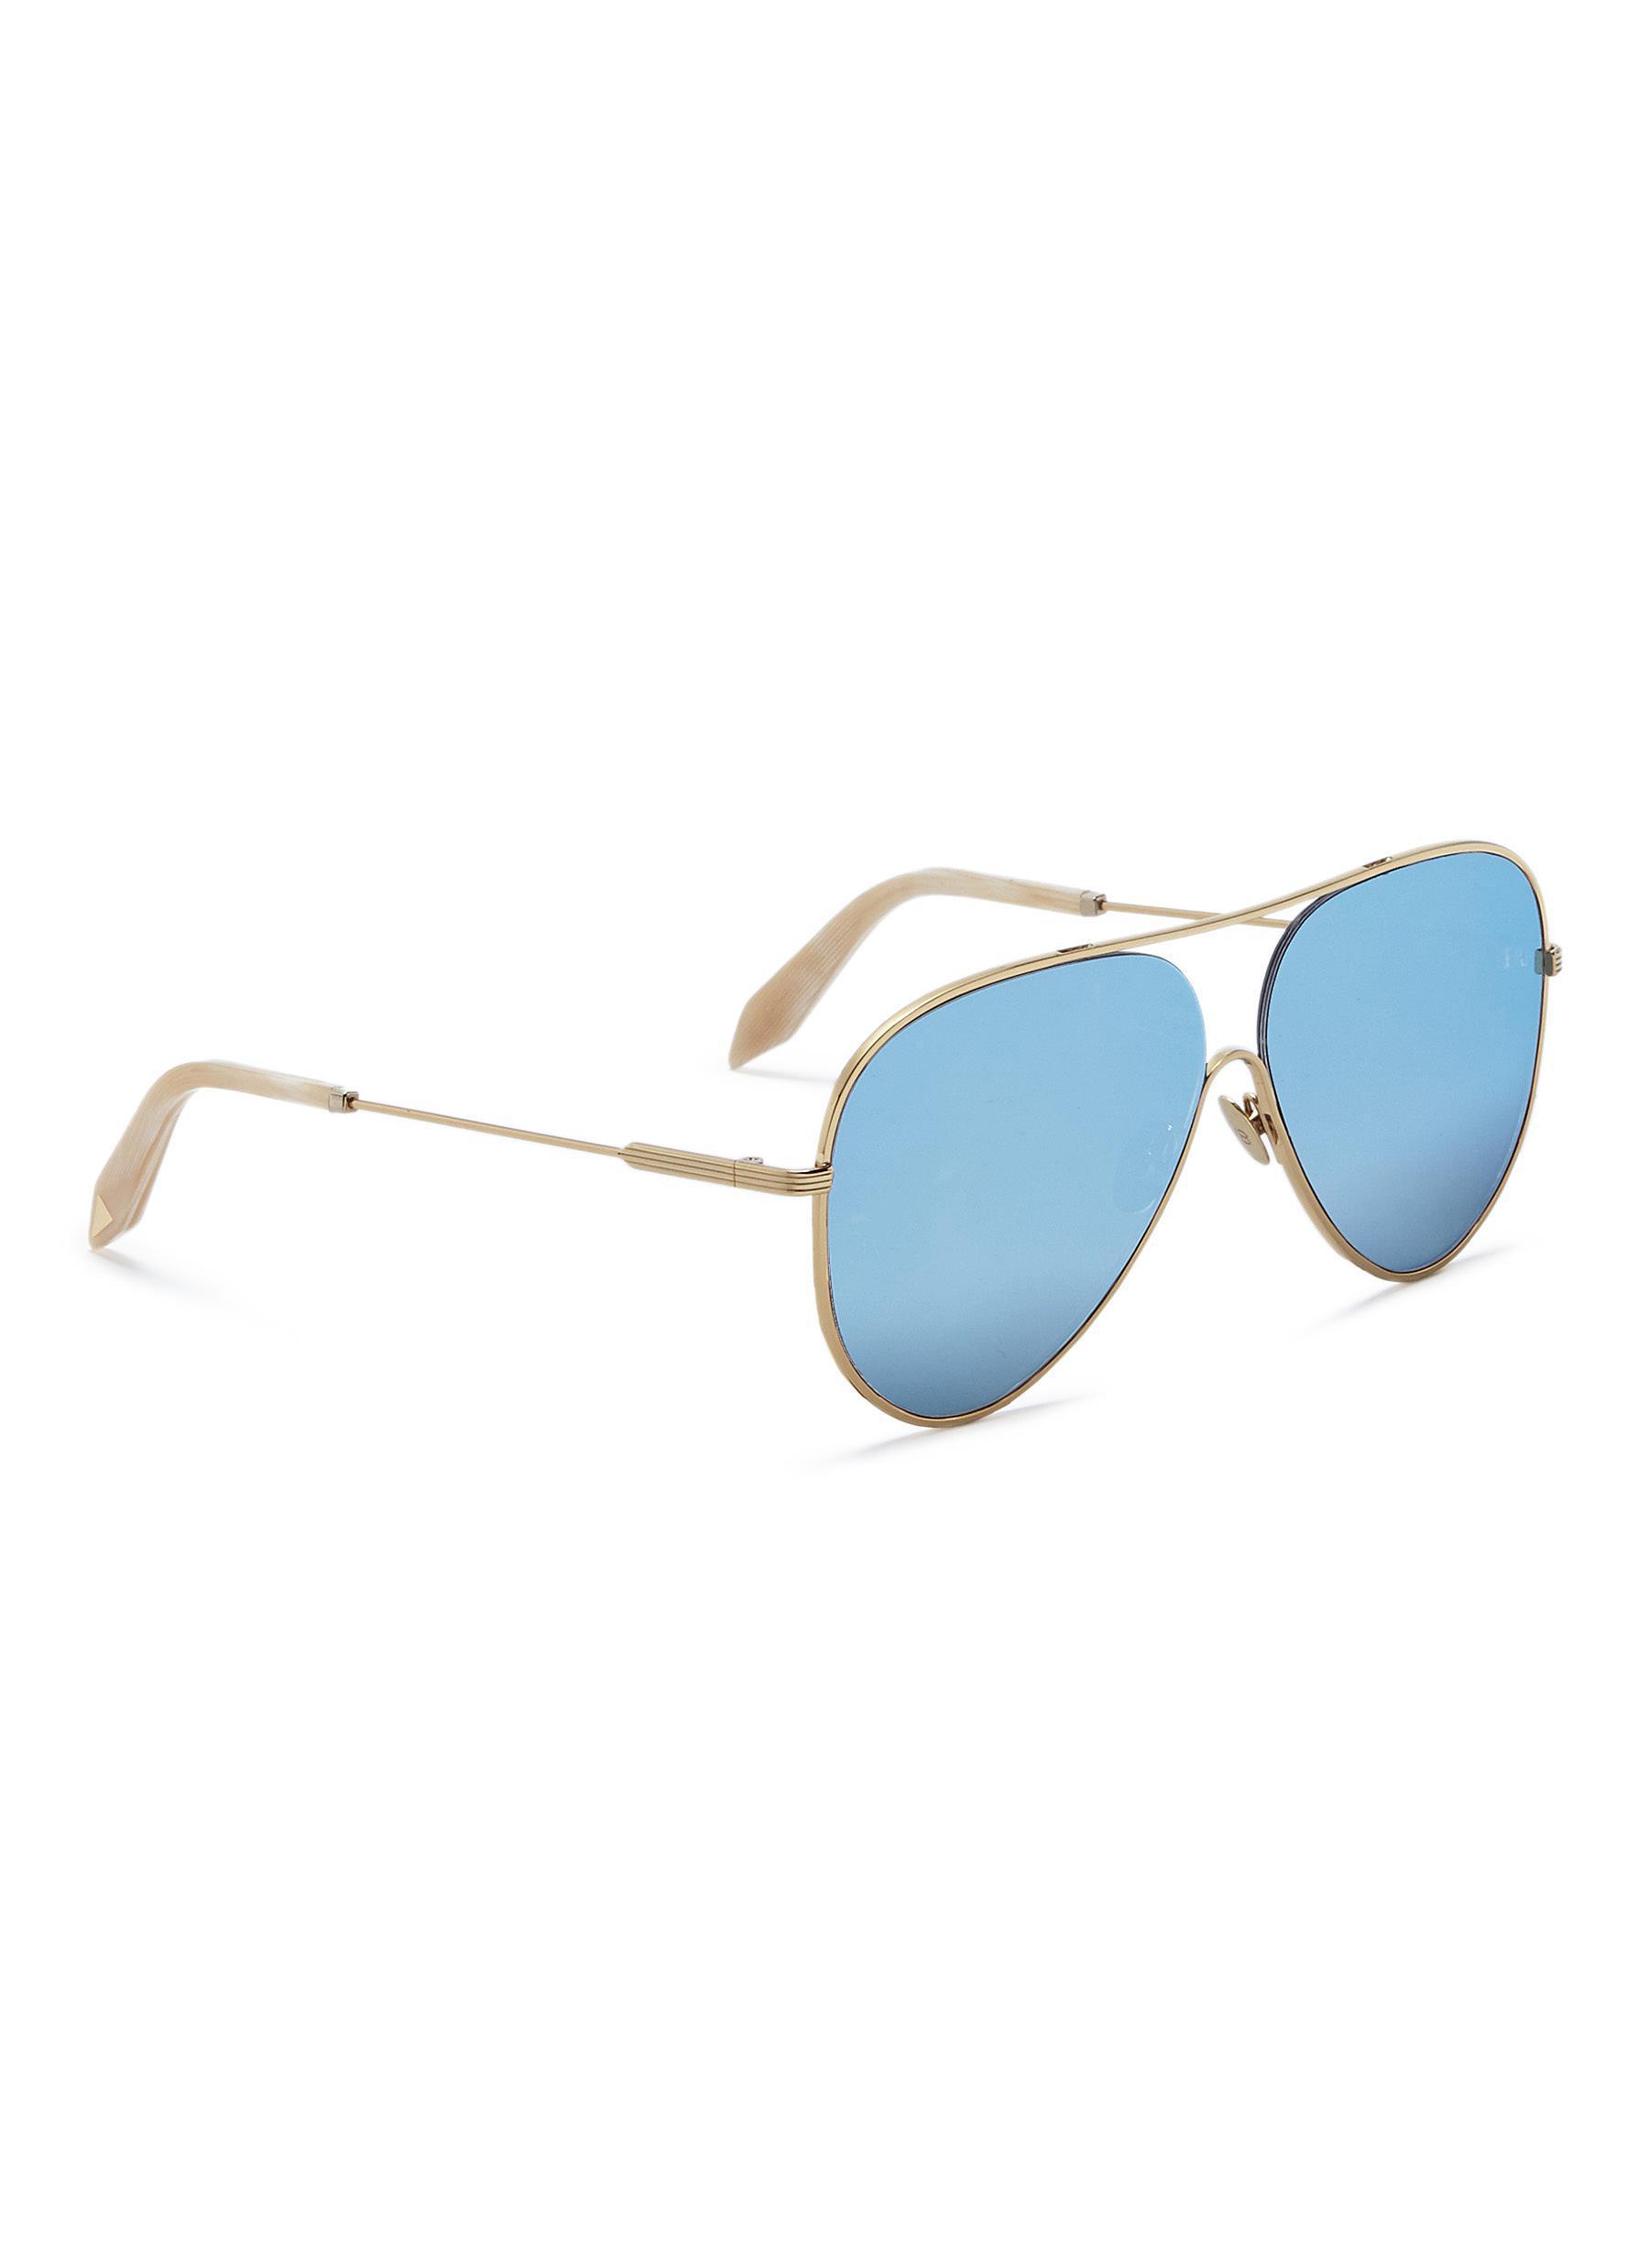 'loop Metal Victoria Blue Mirror Aviator' Beckham Lyst Sunglasses fwqRxB